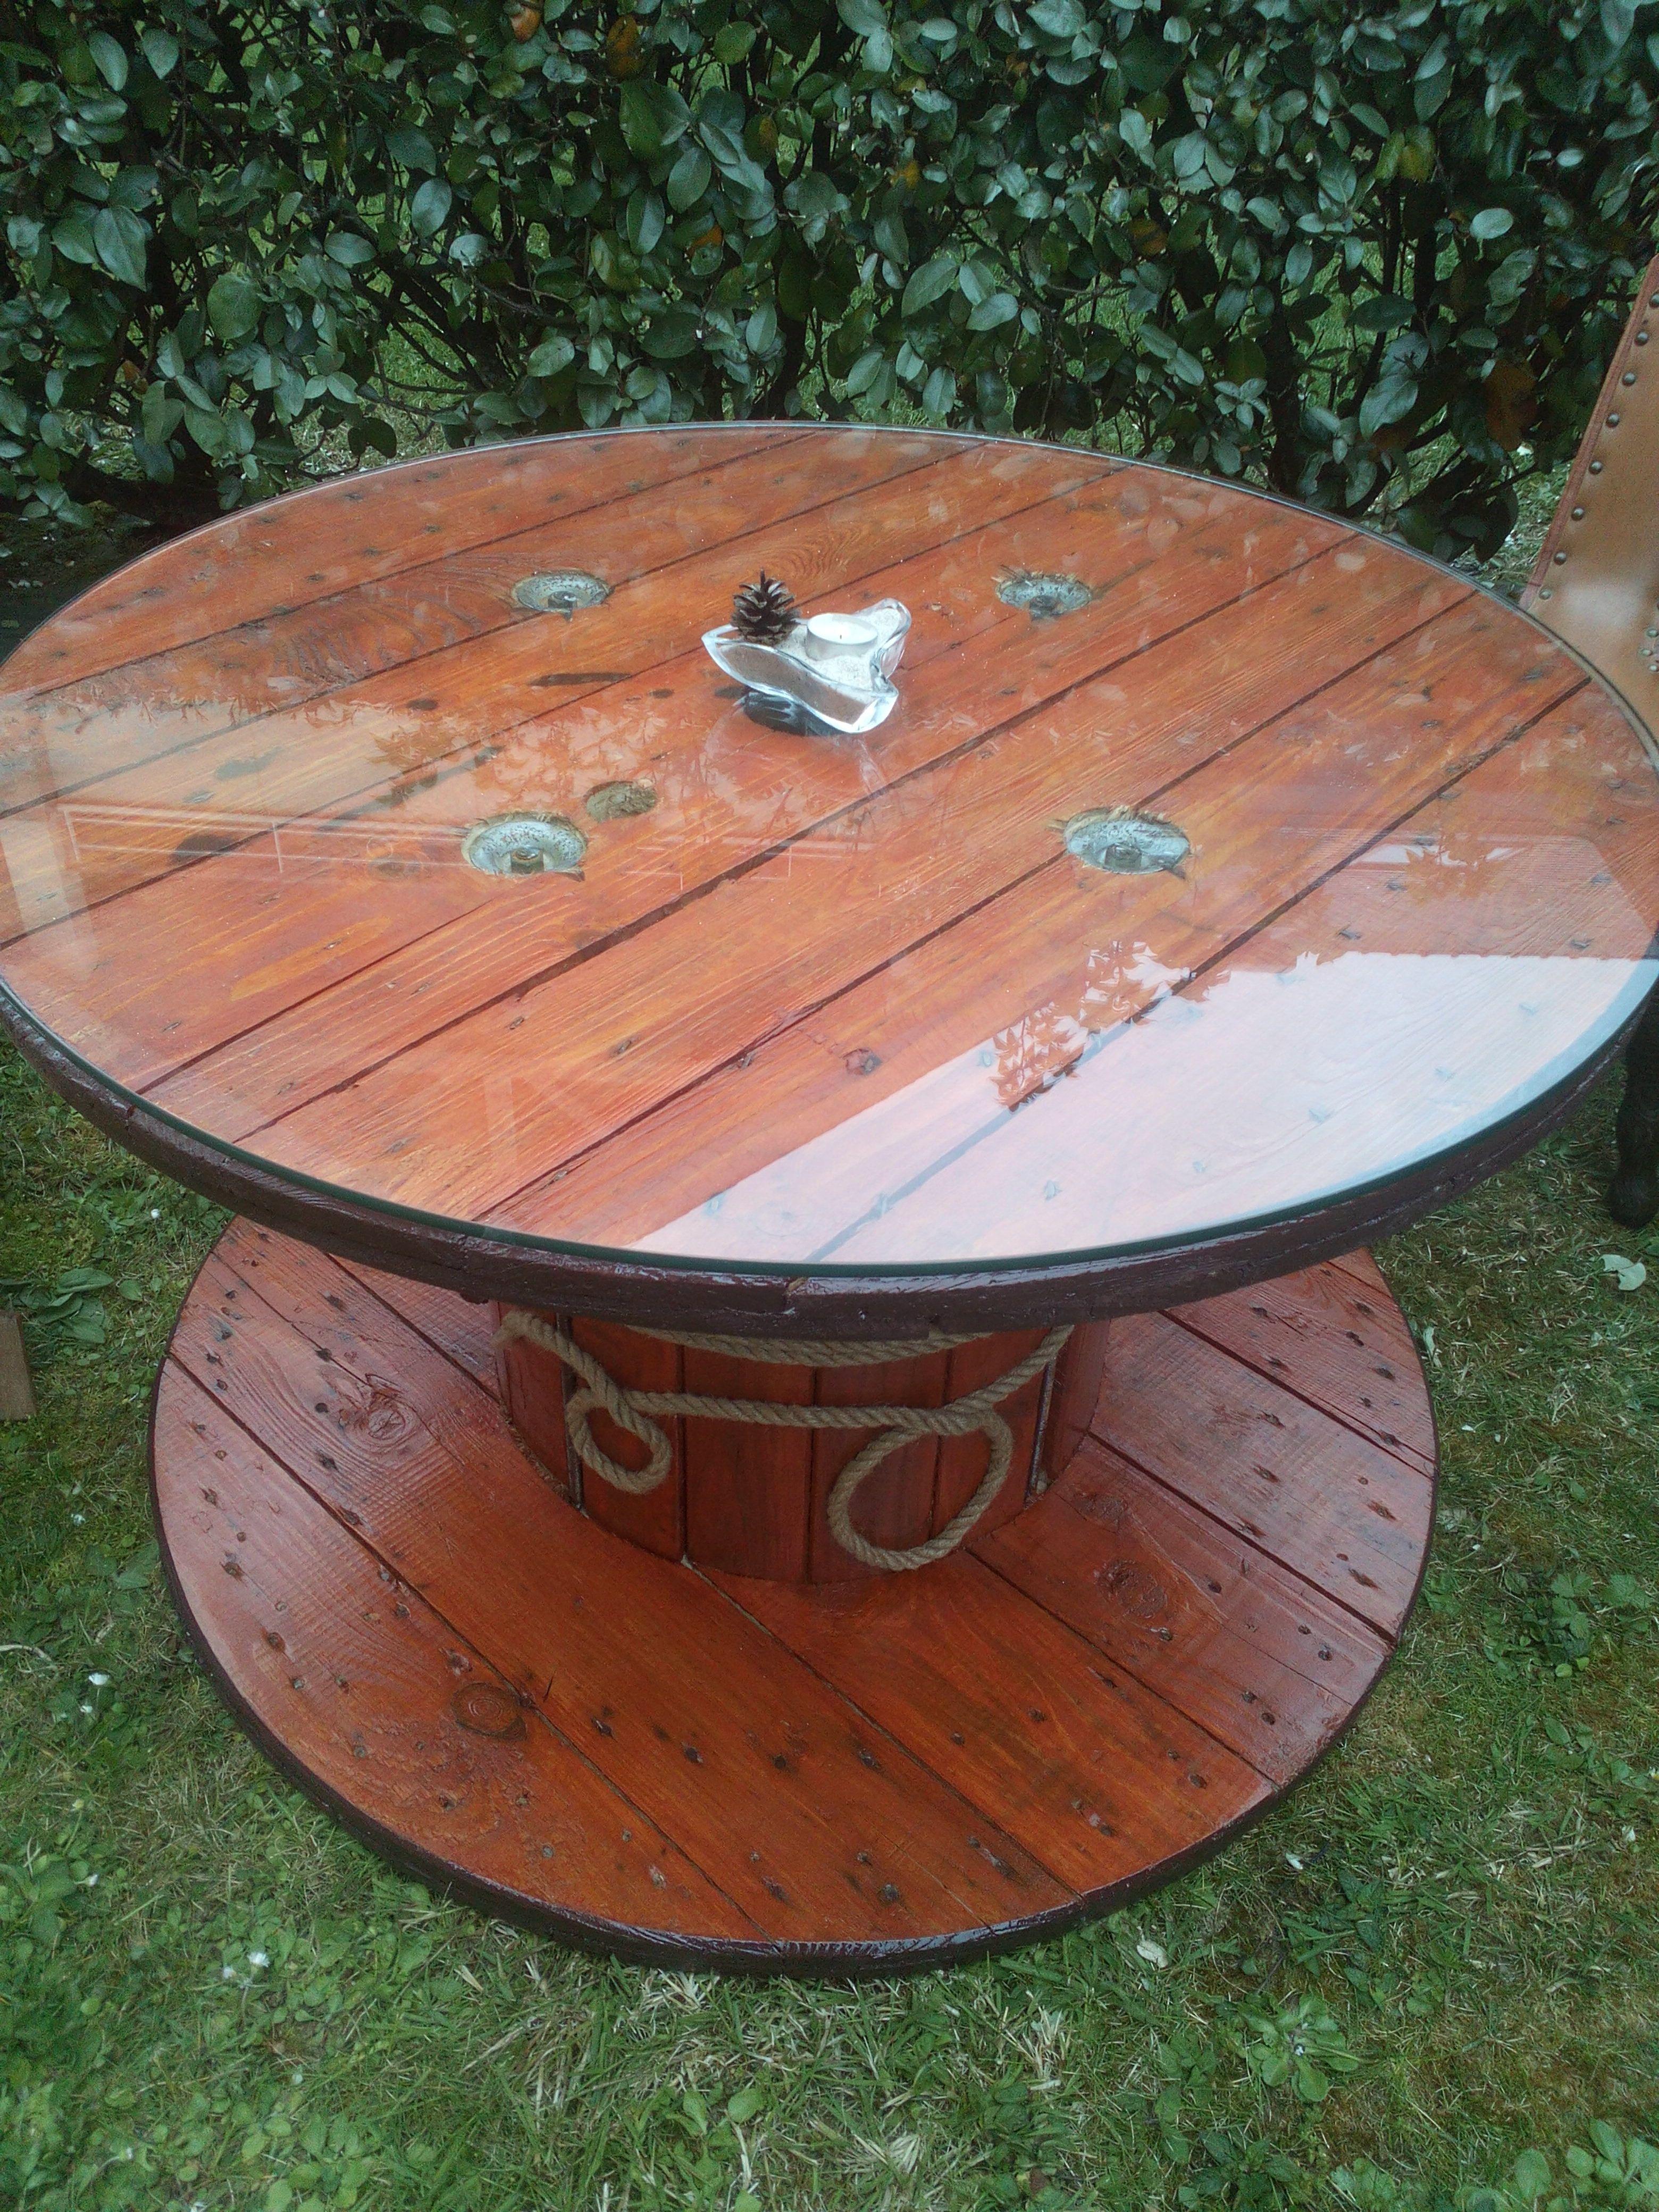 495b9854128555261f5d19a7627e0c7b Frais De Table Basse soldes Des Idées